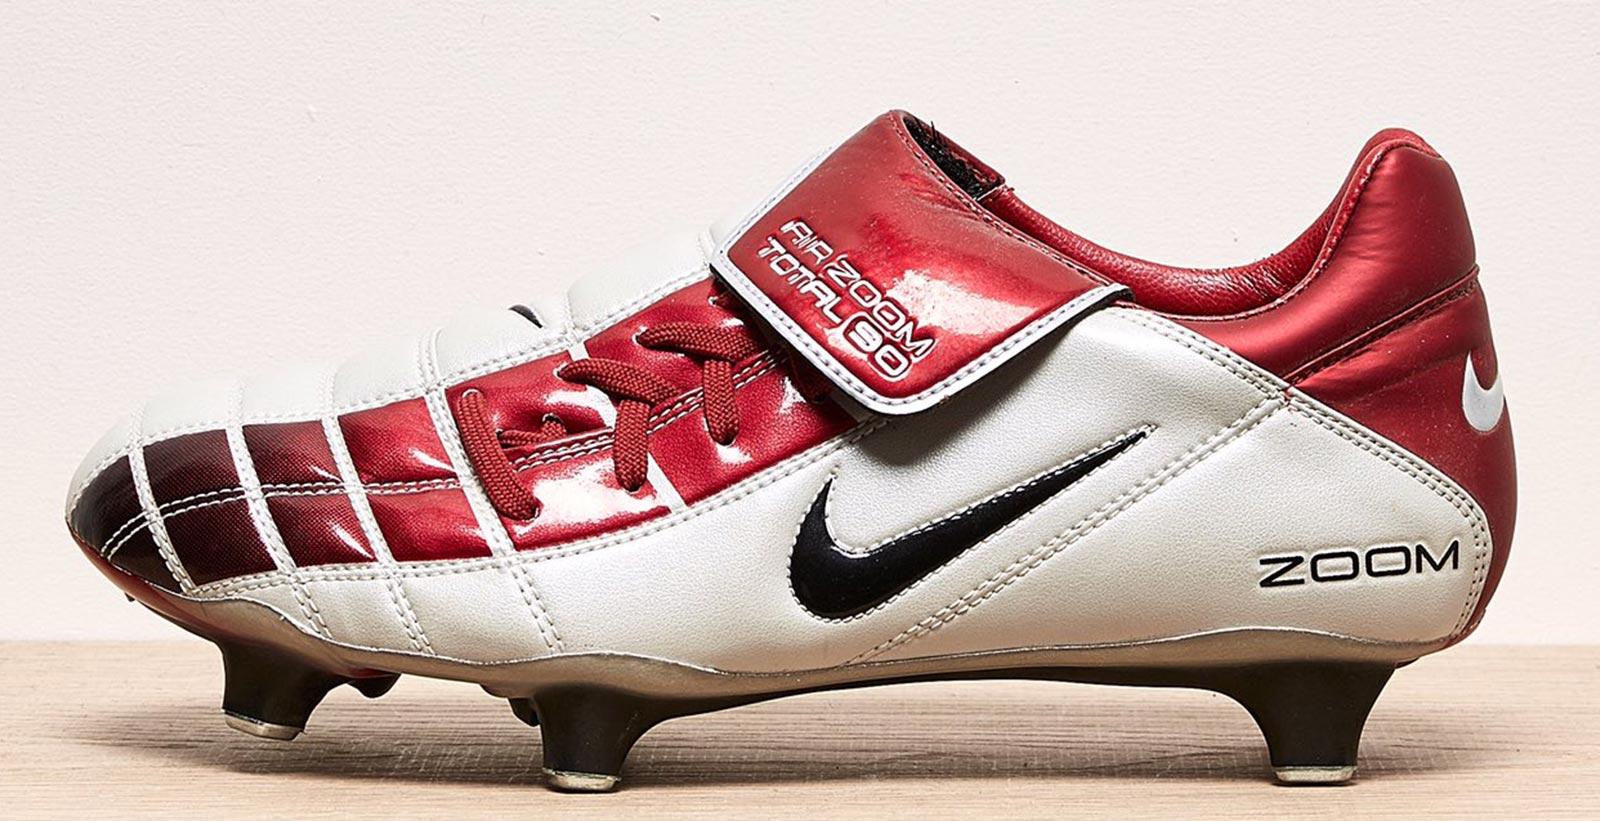 Traer collar más y más  Closer Look: Nike Air Zoom Total 90 II 2002 Football Boots - Footy Headlines